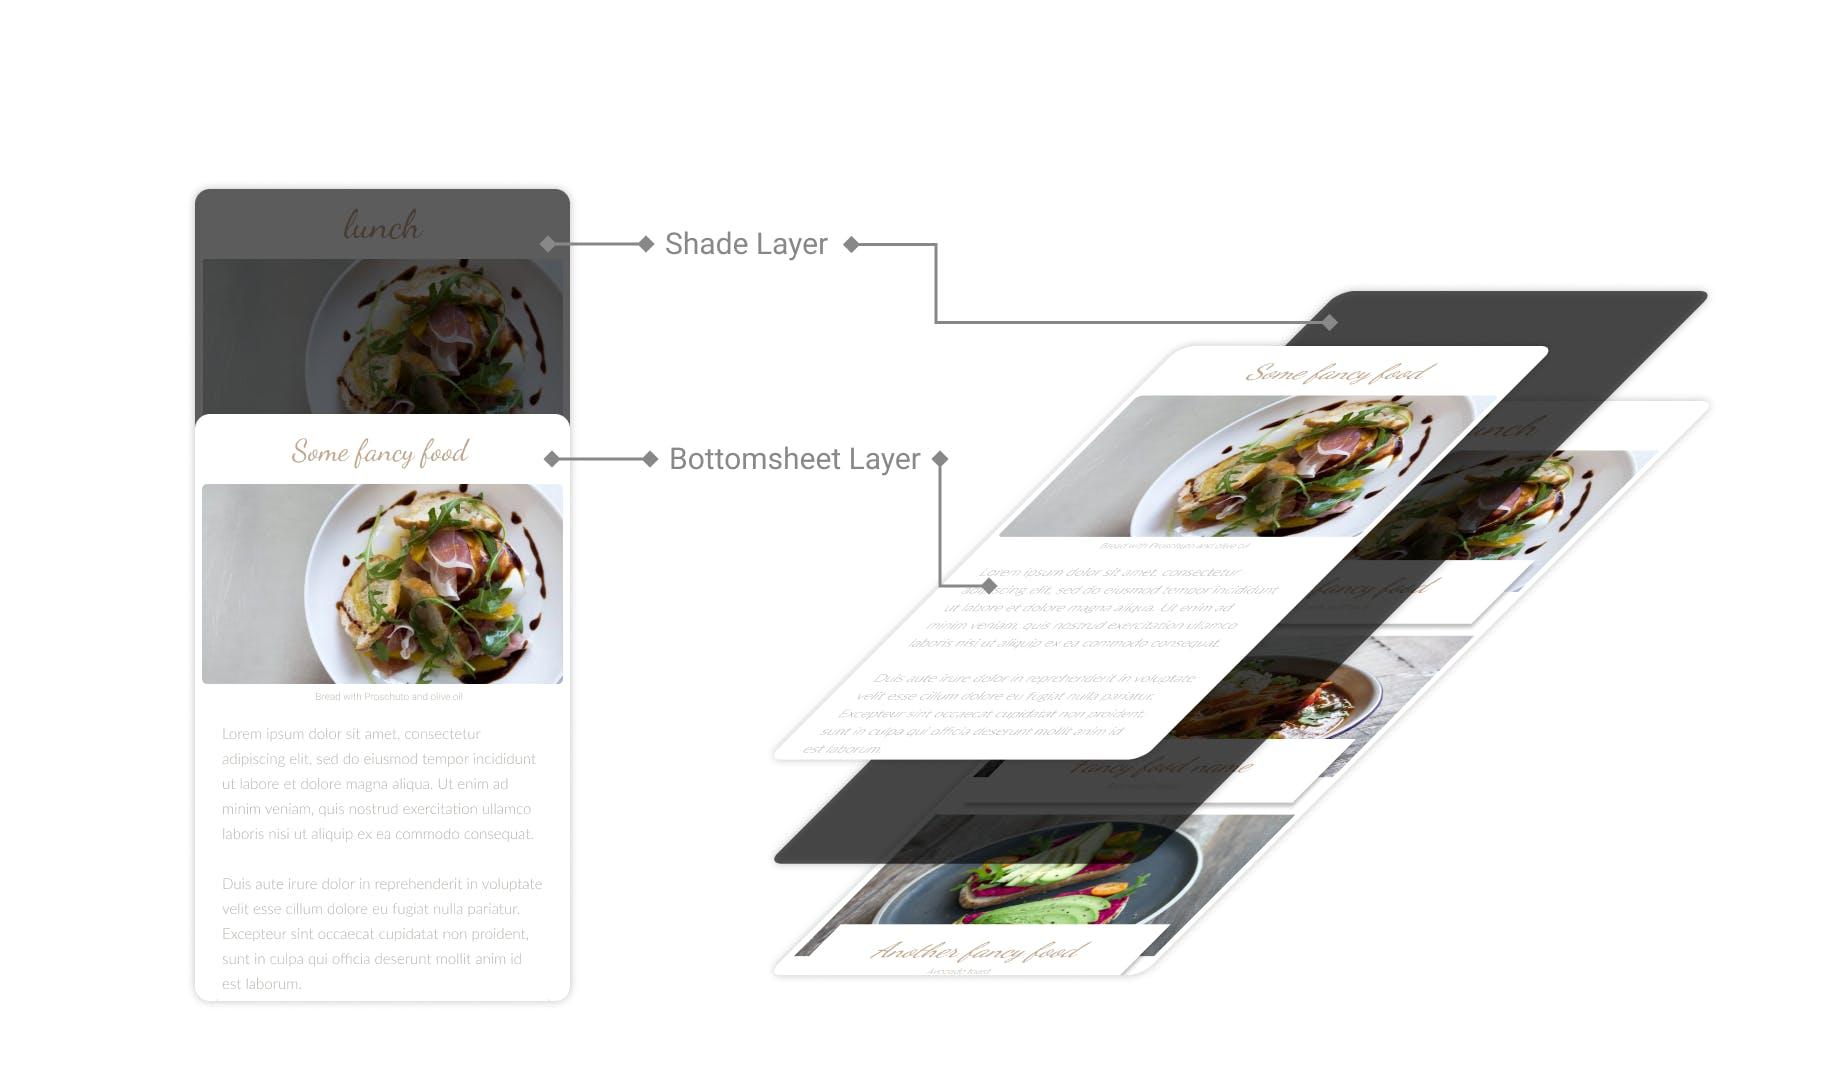 ionic-bottomsheet-layout-breakdown.png